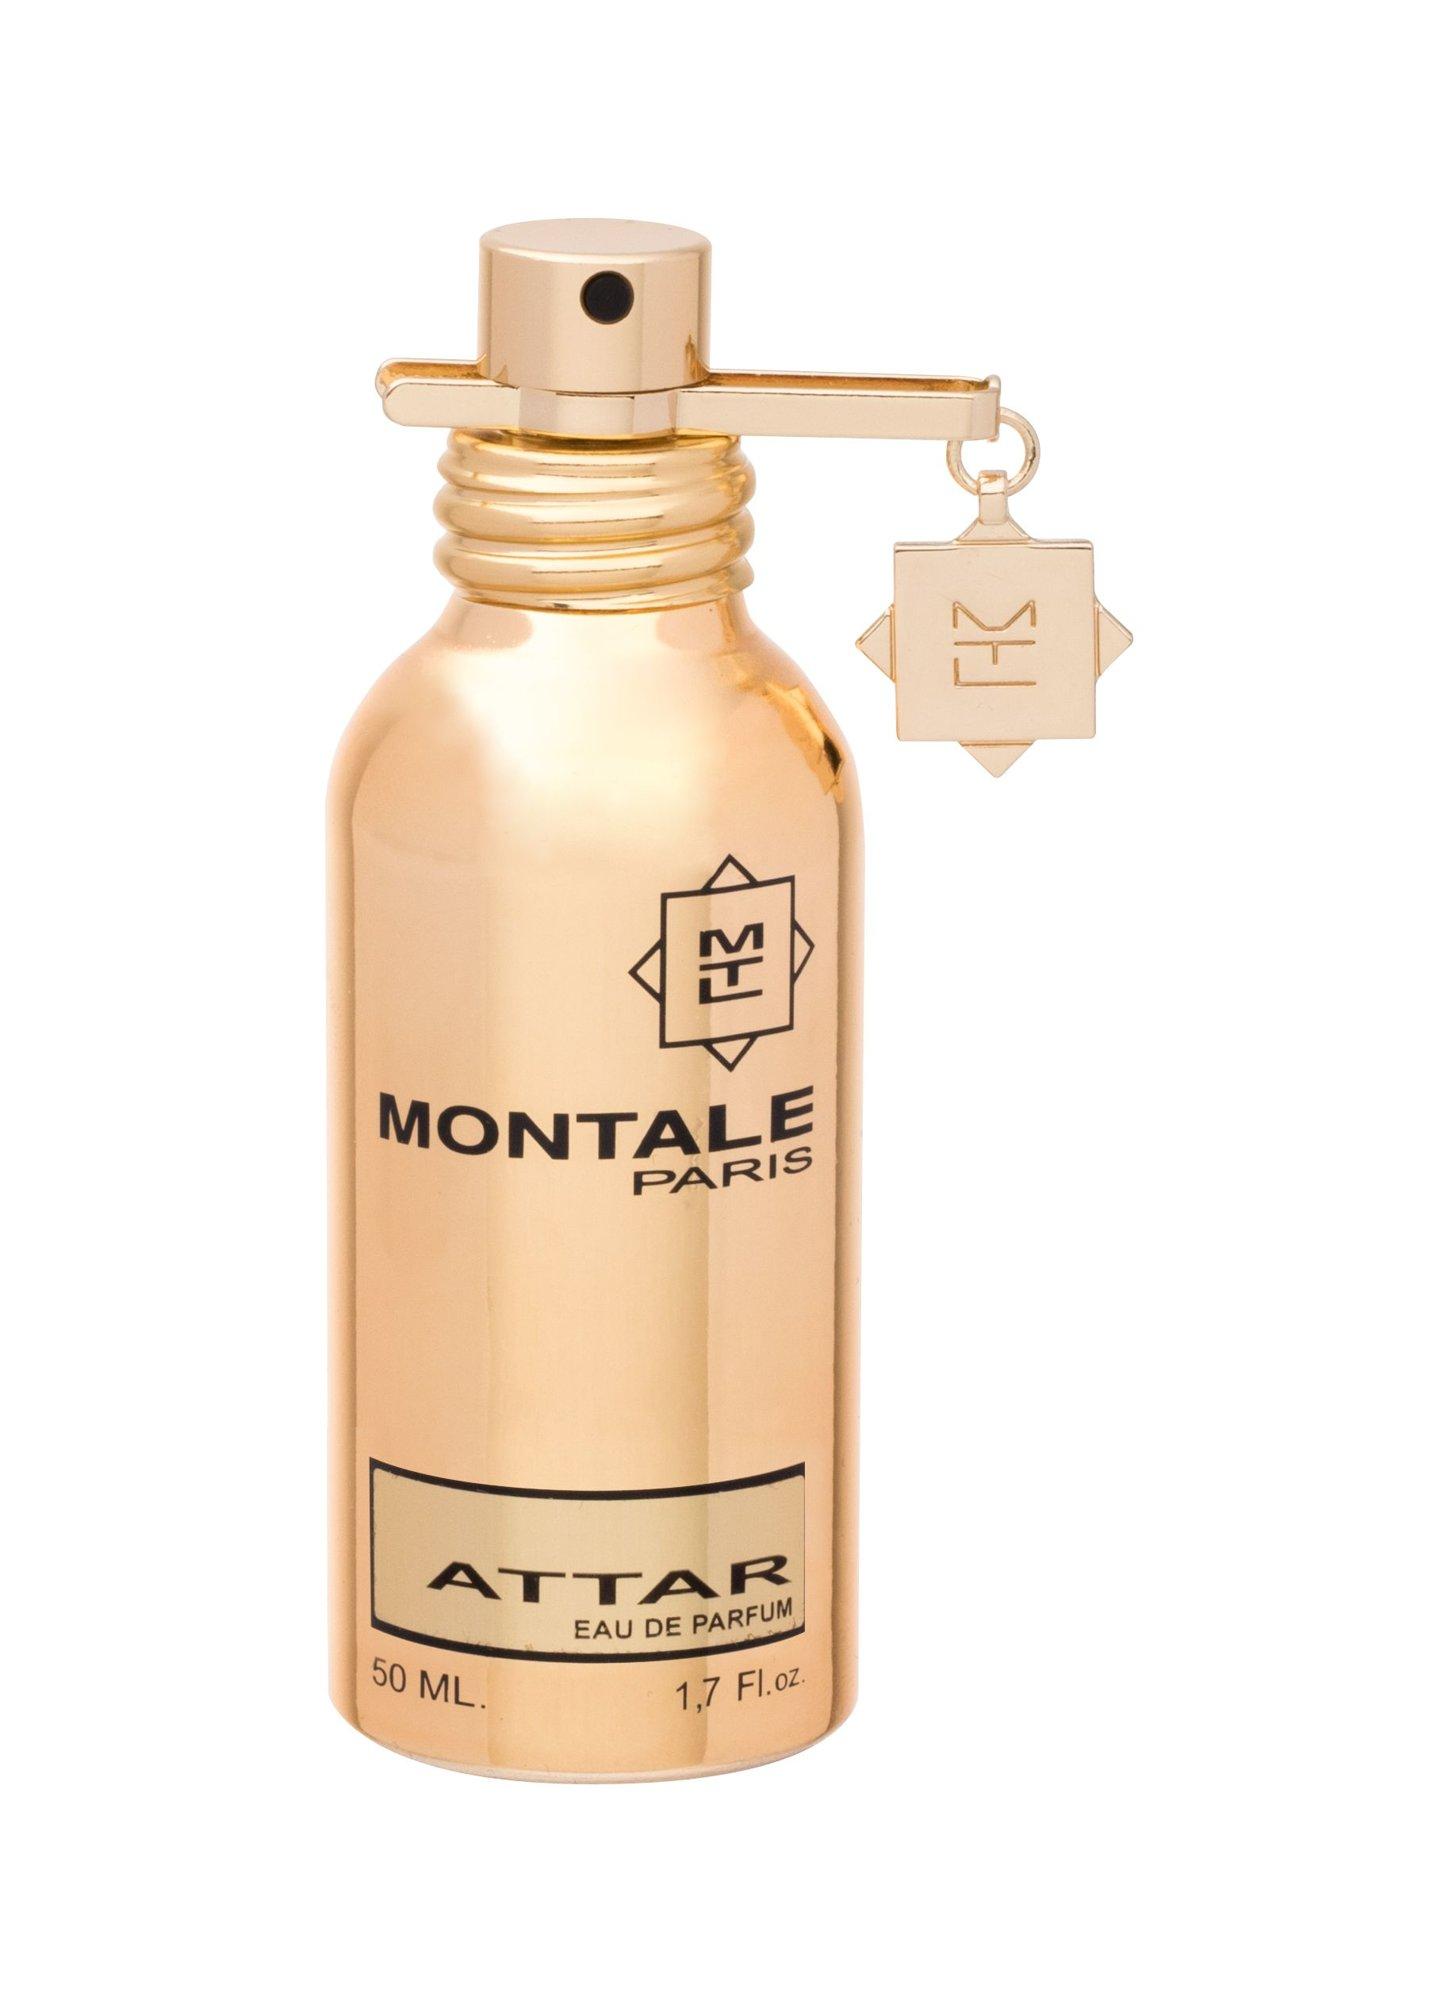 Montale Paris Attar EDP 50ml